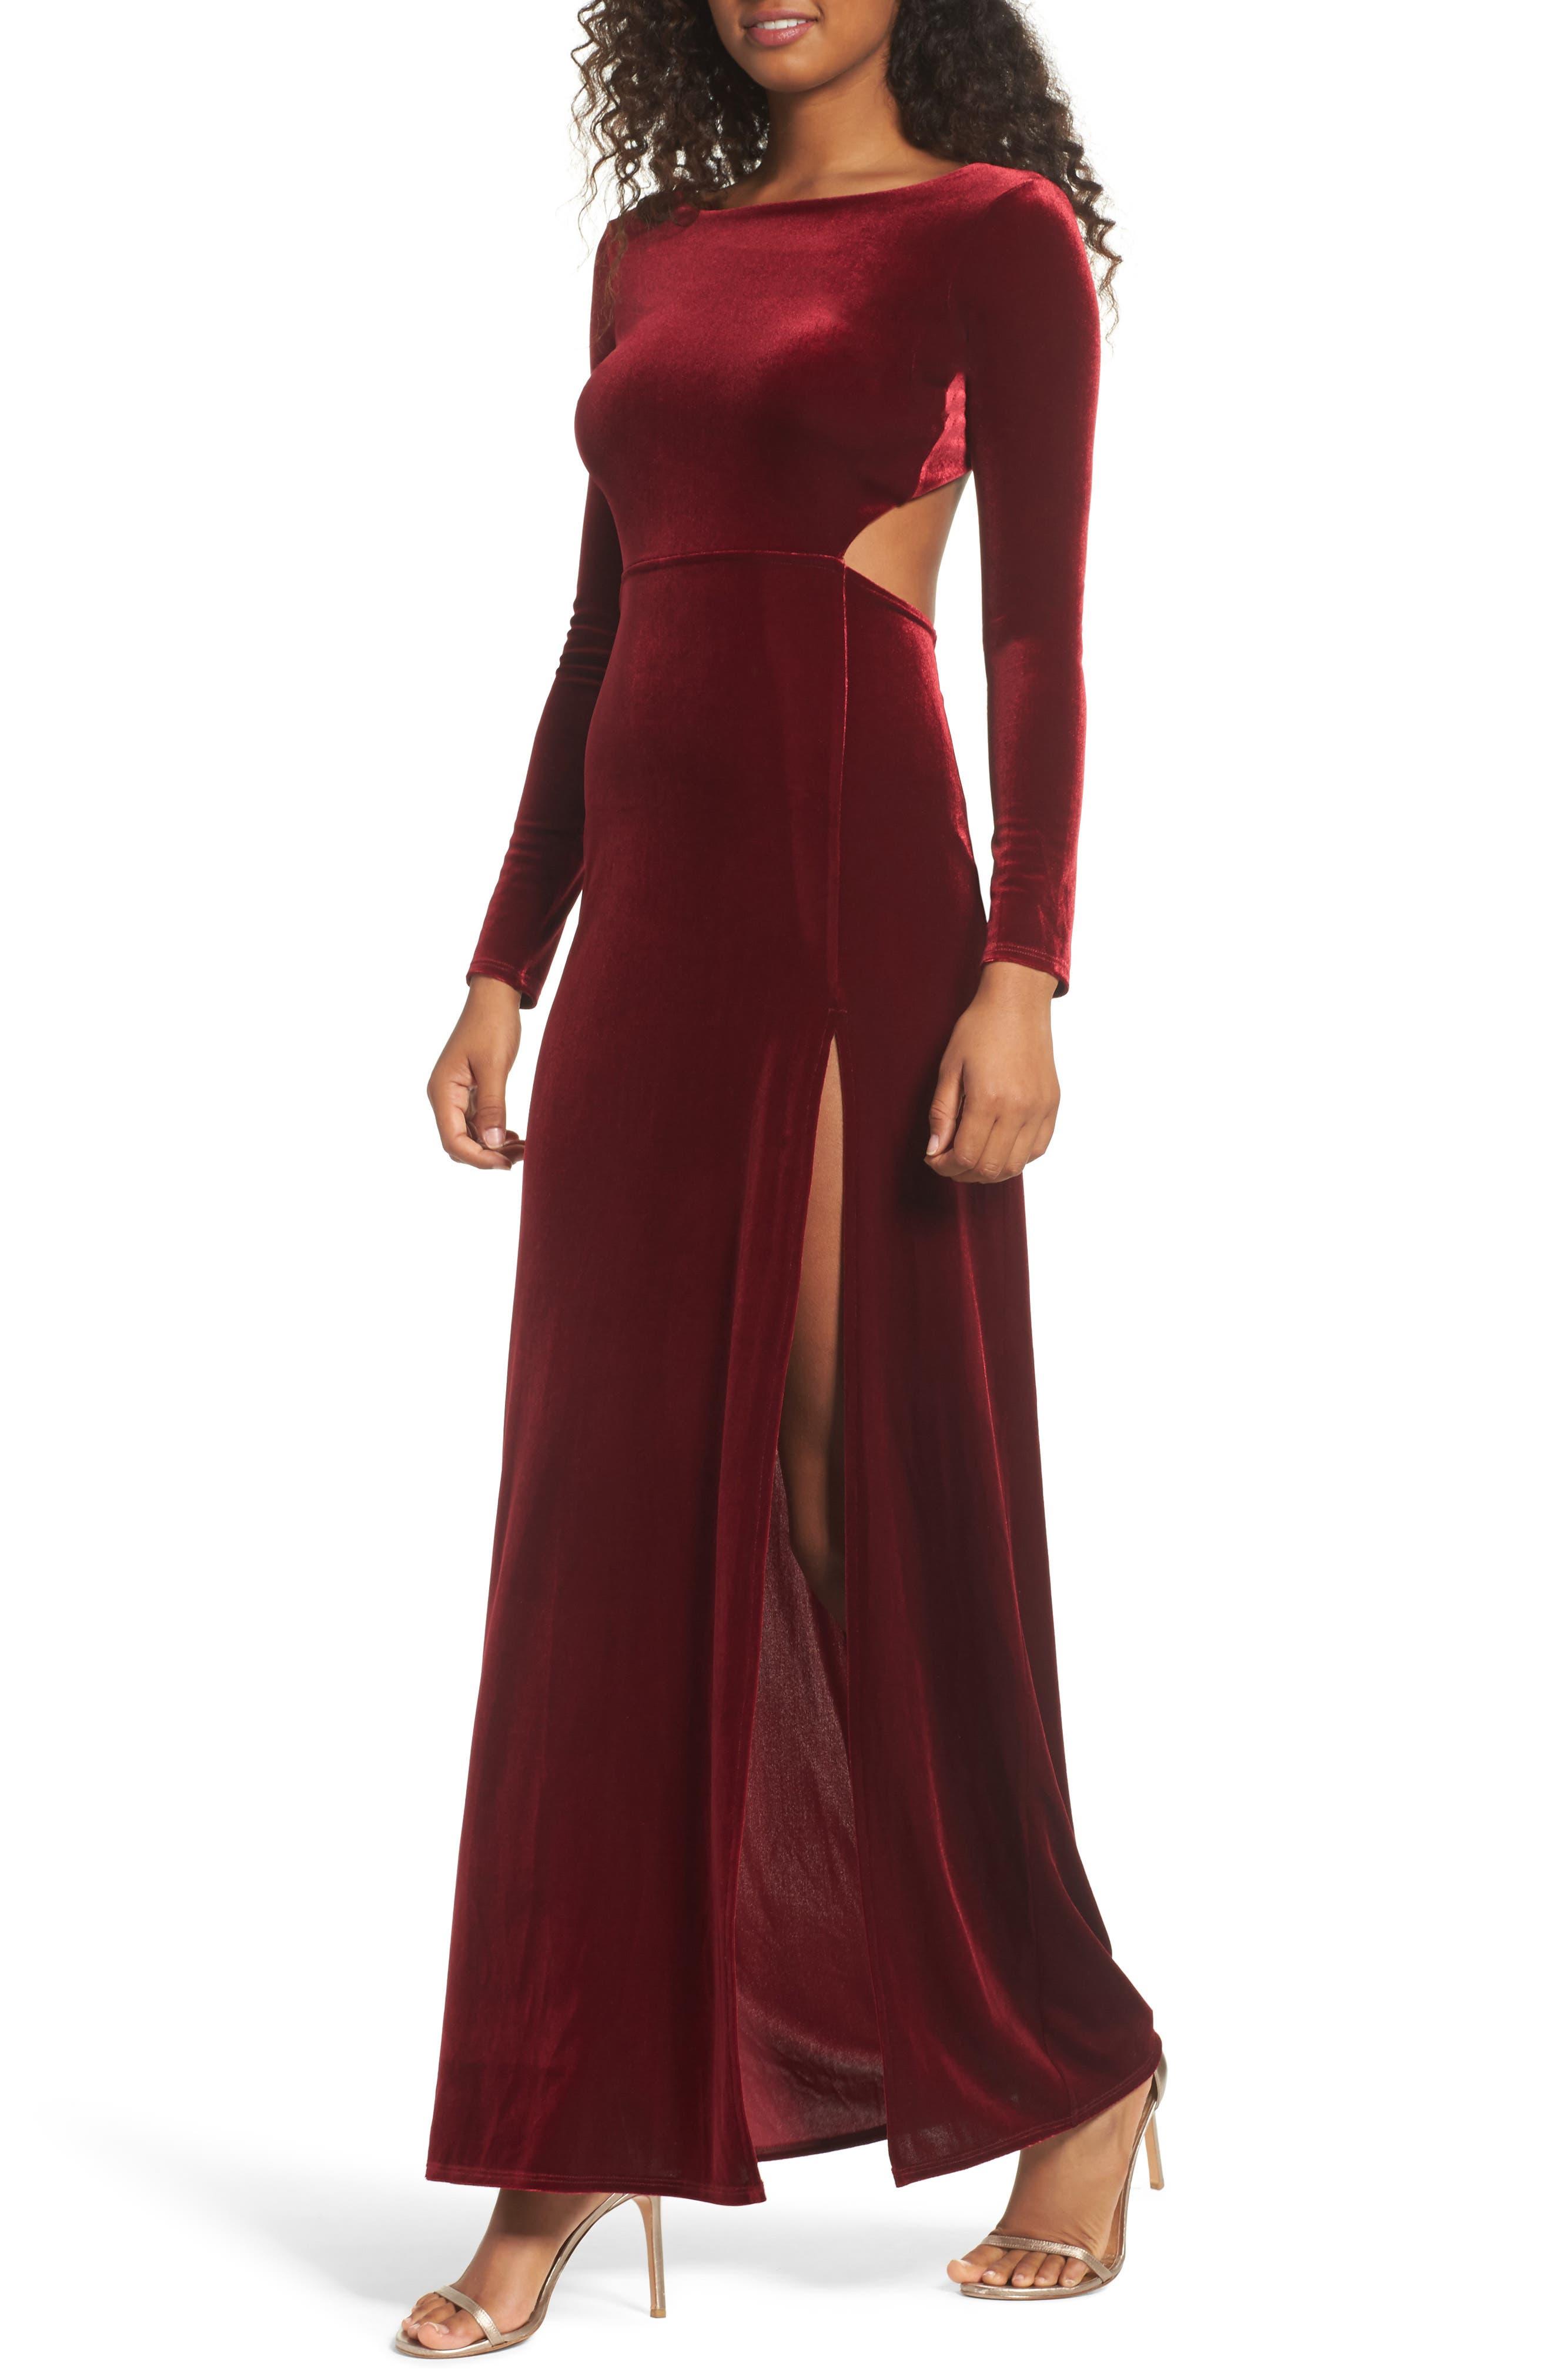 Besame Long Sleeve Velvet Maxi Dress,                             Main thumbnail 1, color,                             620